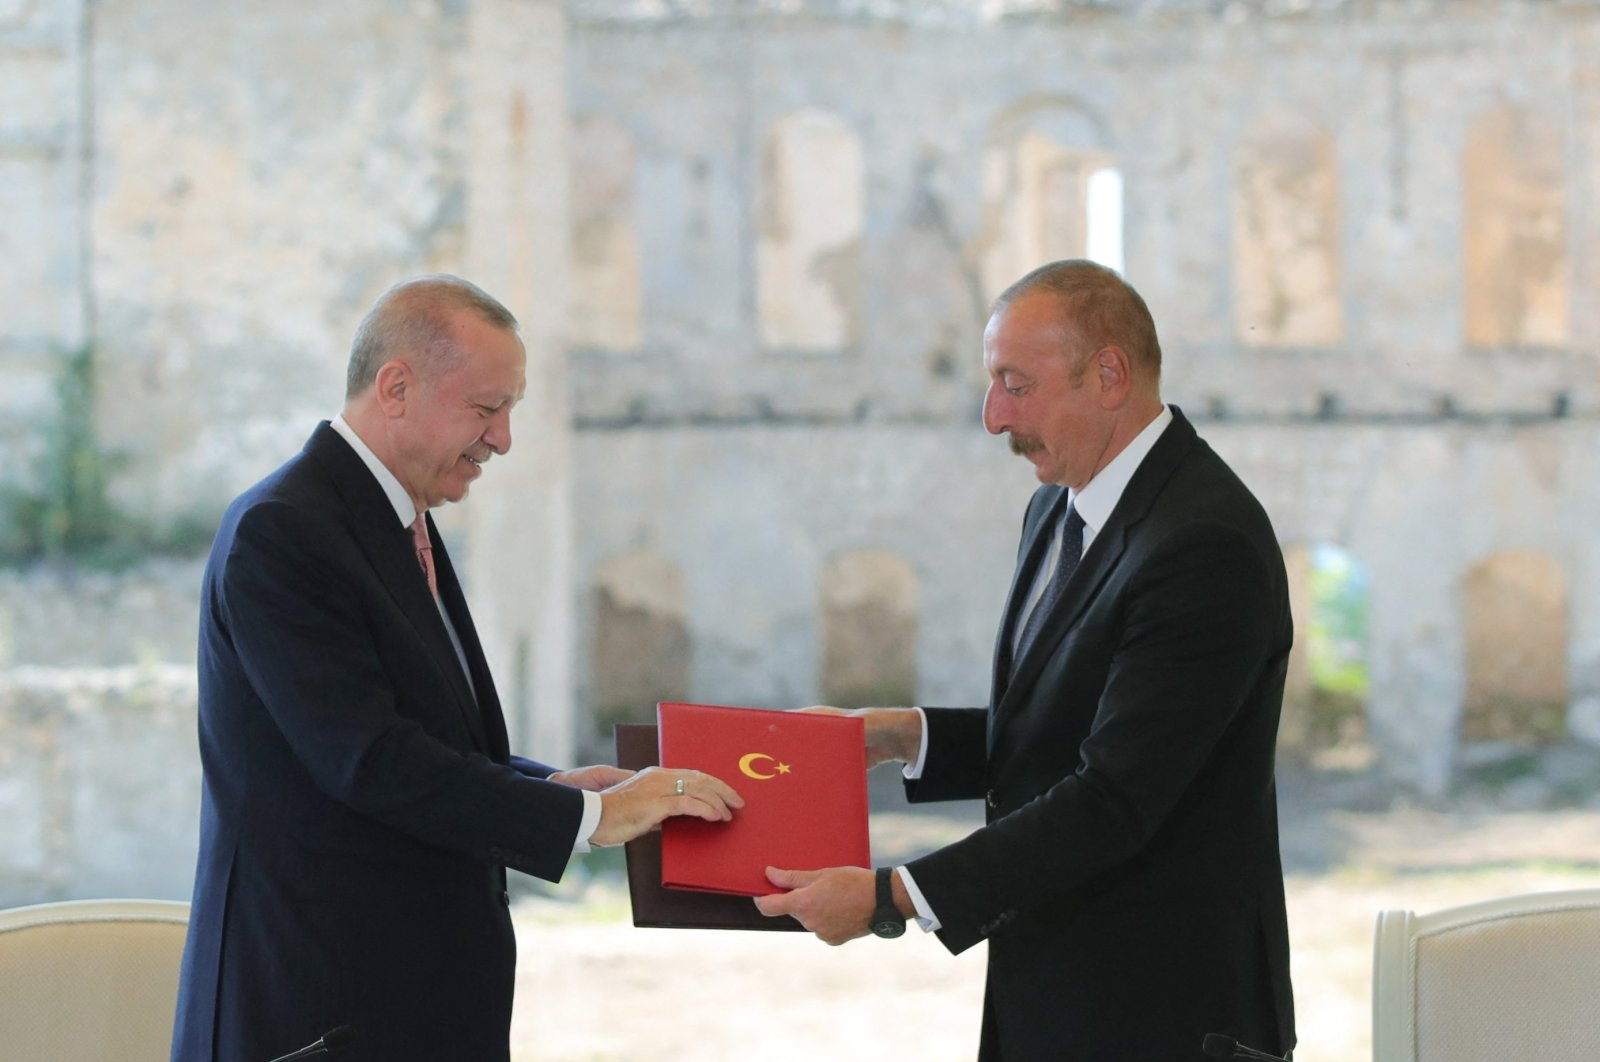 Azerbaijani President Ilham Aliyev (R) and Turkish President Recep Tayyip Erdoğan (L) exchange the signed  'Shusha Declaration' in Shusha, Azerbaijan, June 15, 2021. (handout photo released by the Turkish President's Press Office)